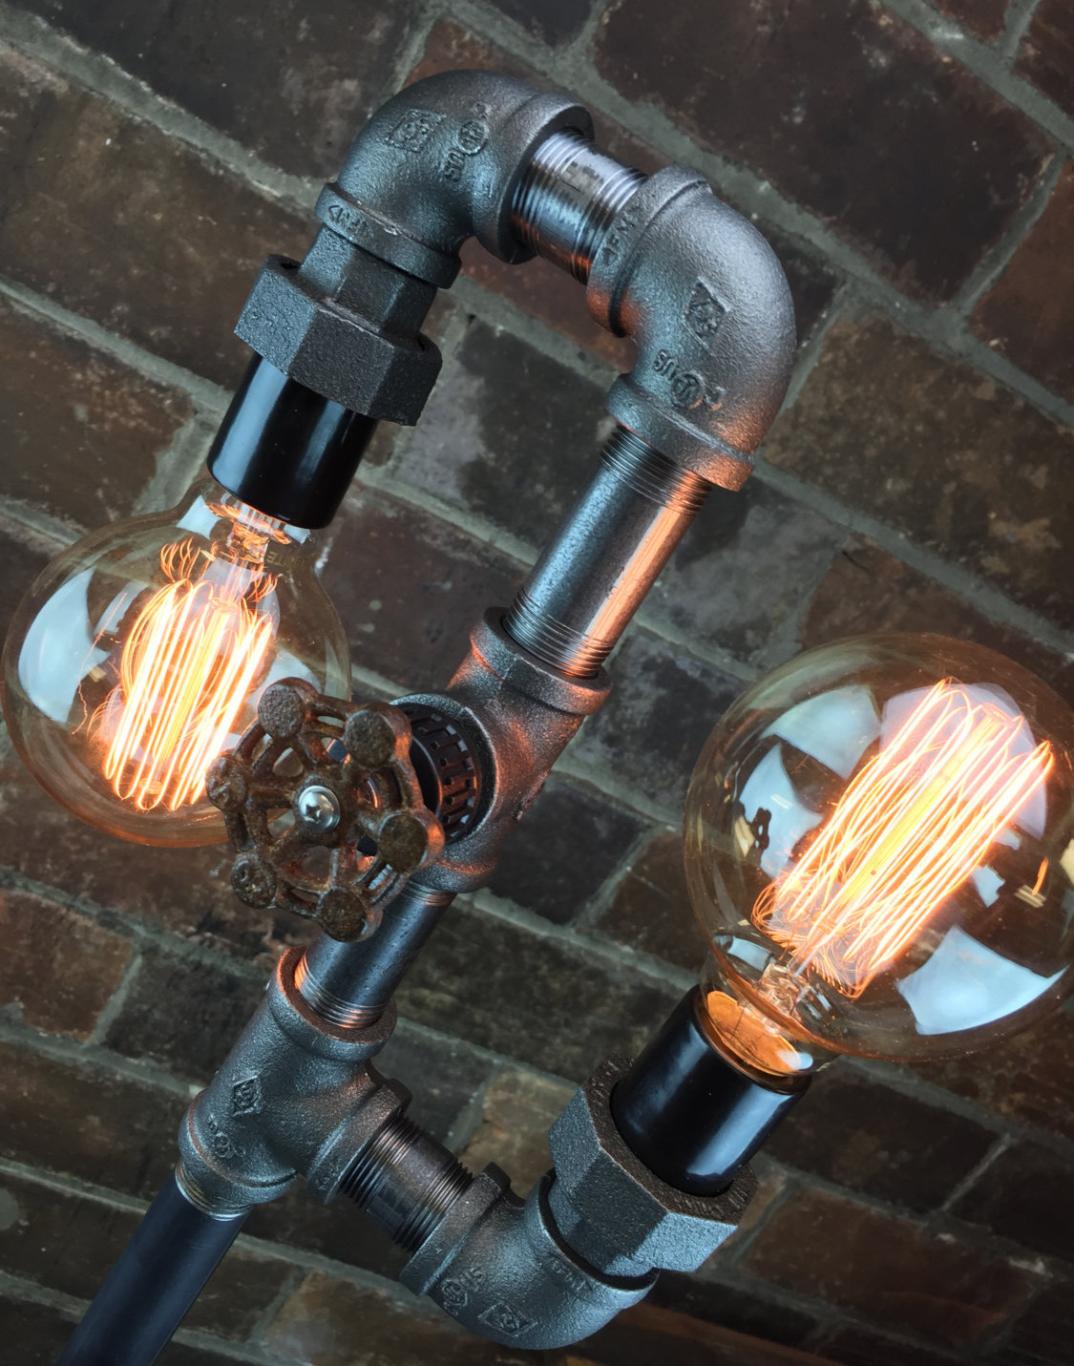 lampade-applique-stile-industrial-bottiglie-vetro-tubi ...